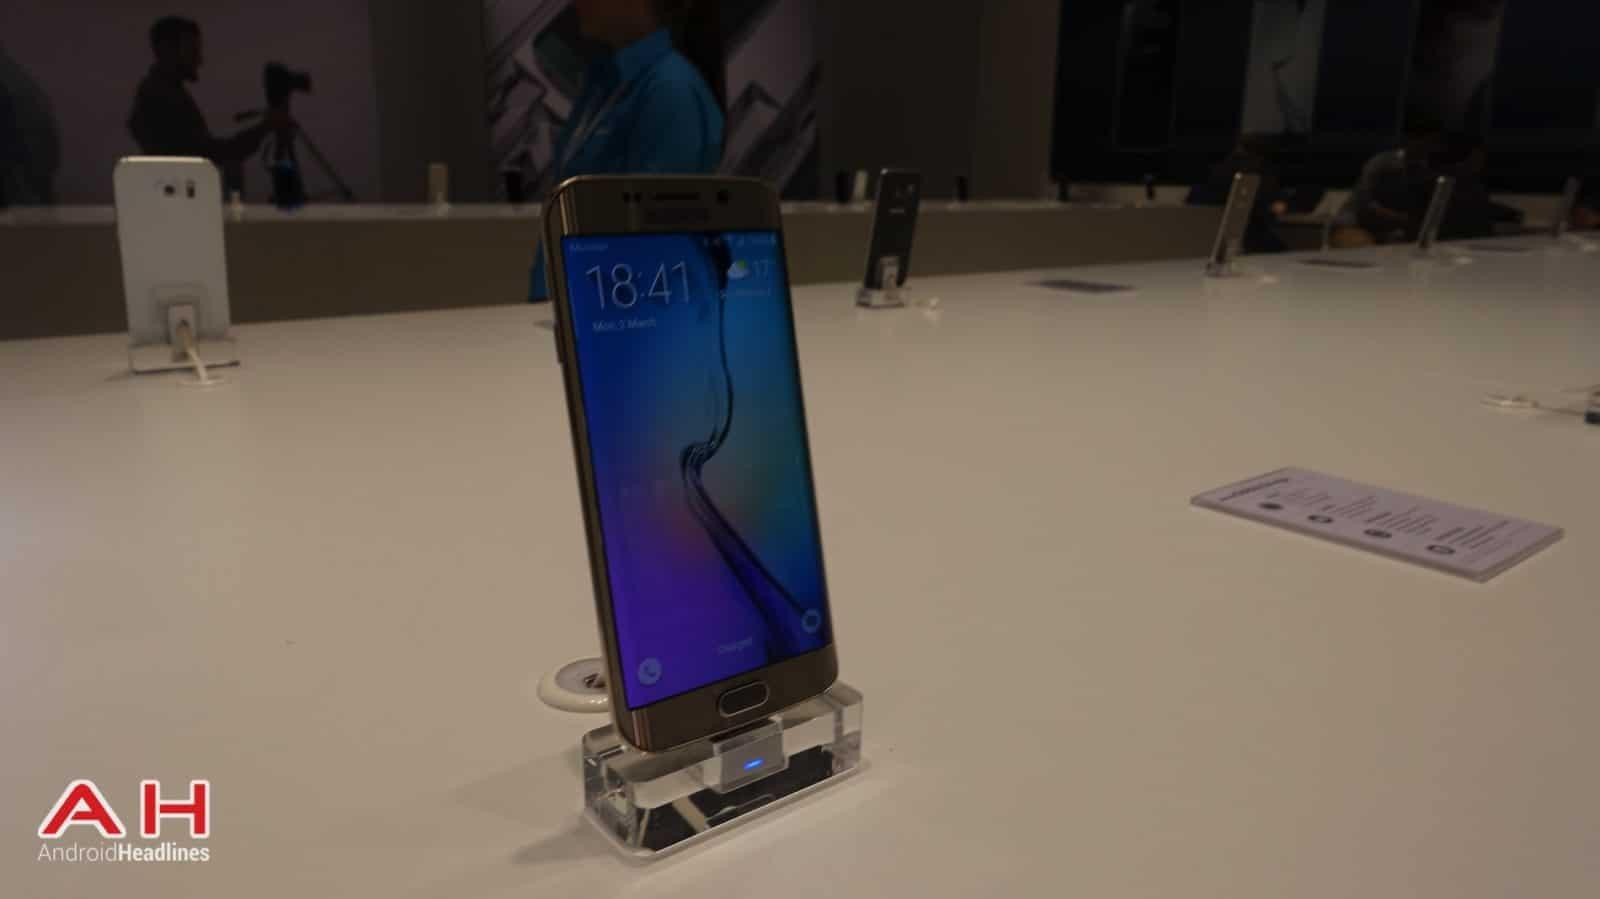 Galaxy S6 and Galaxy S6 Edge MWC AH 26